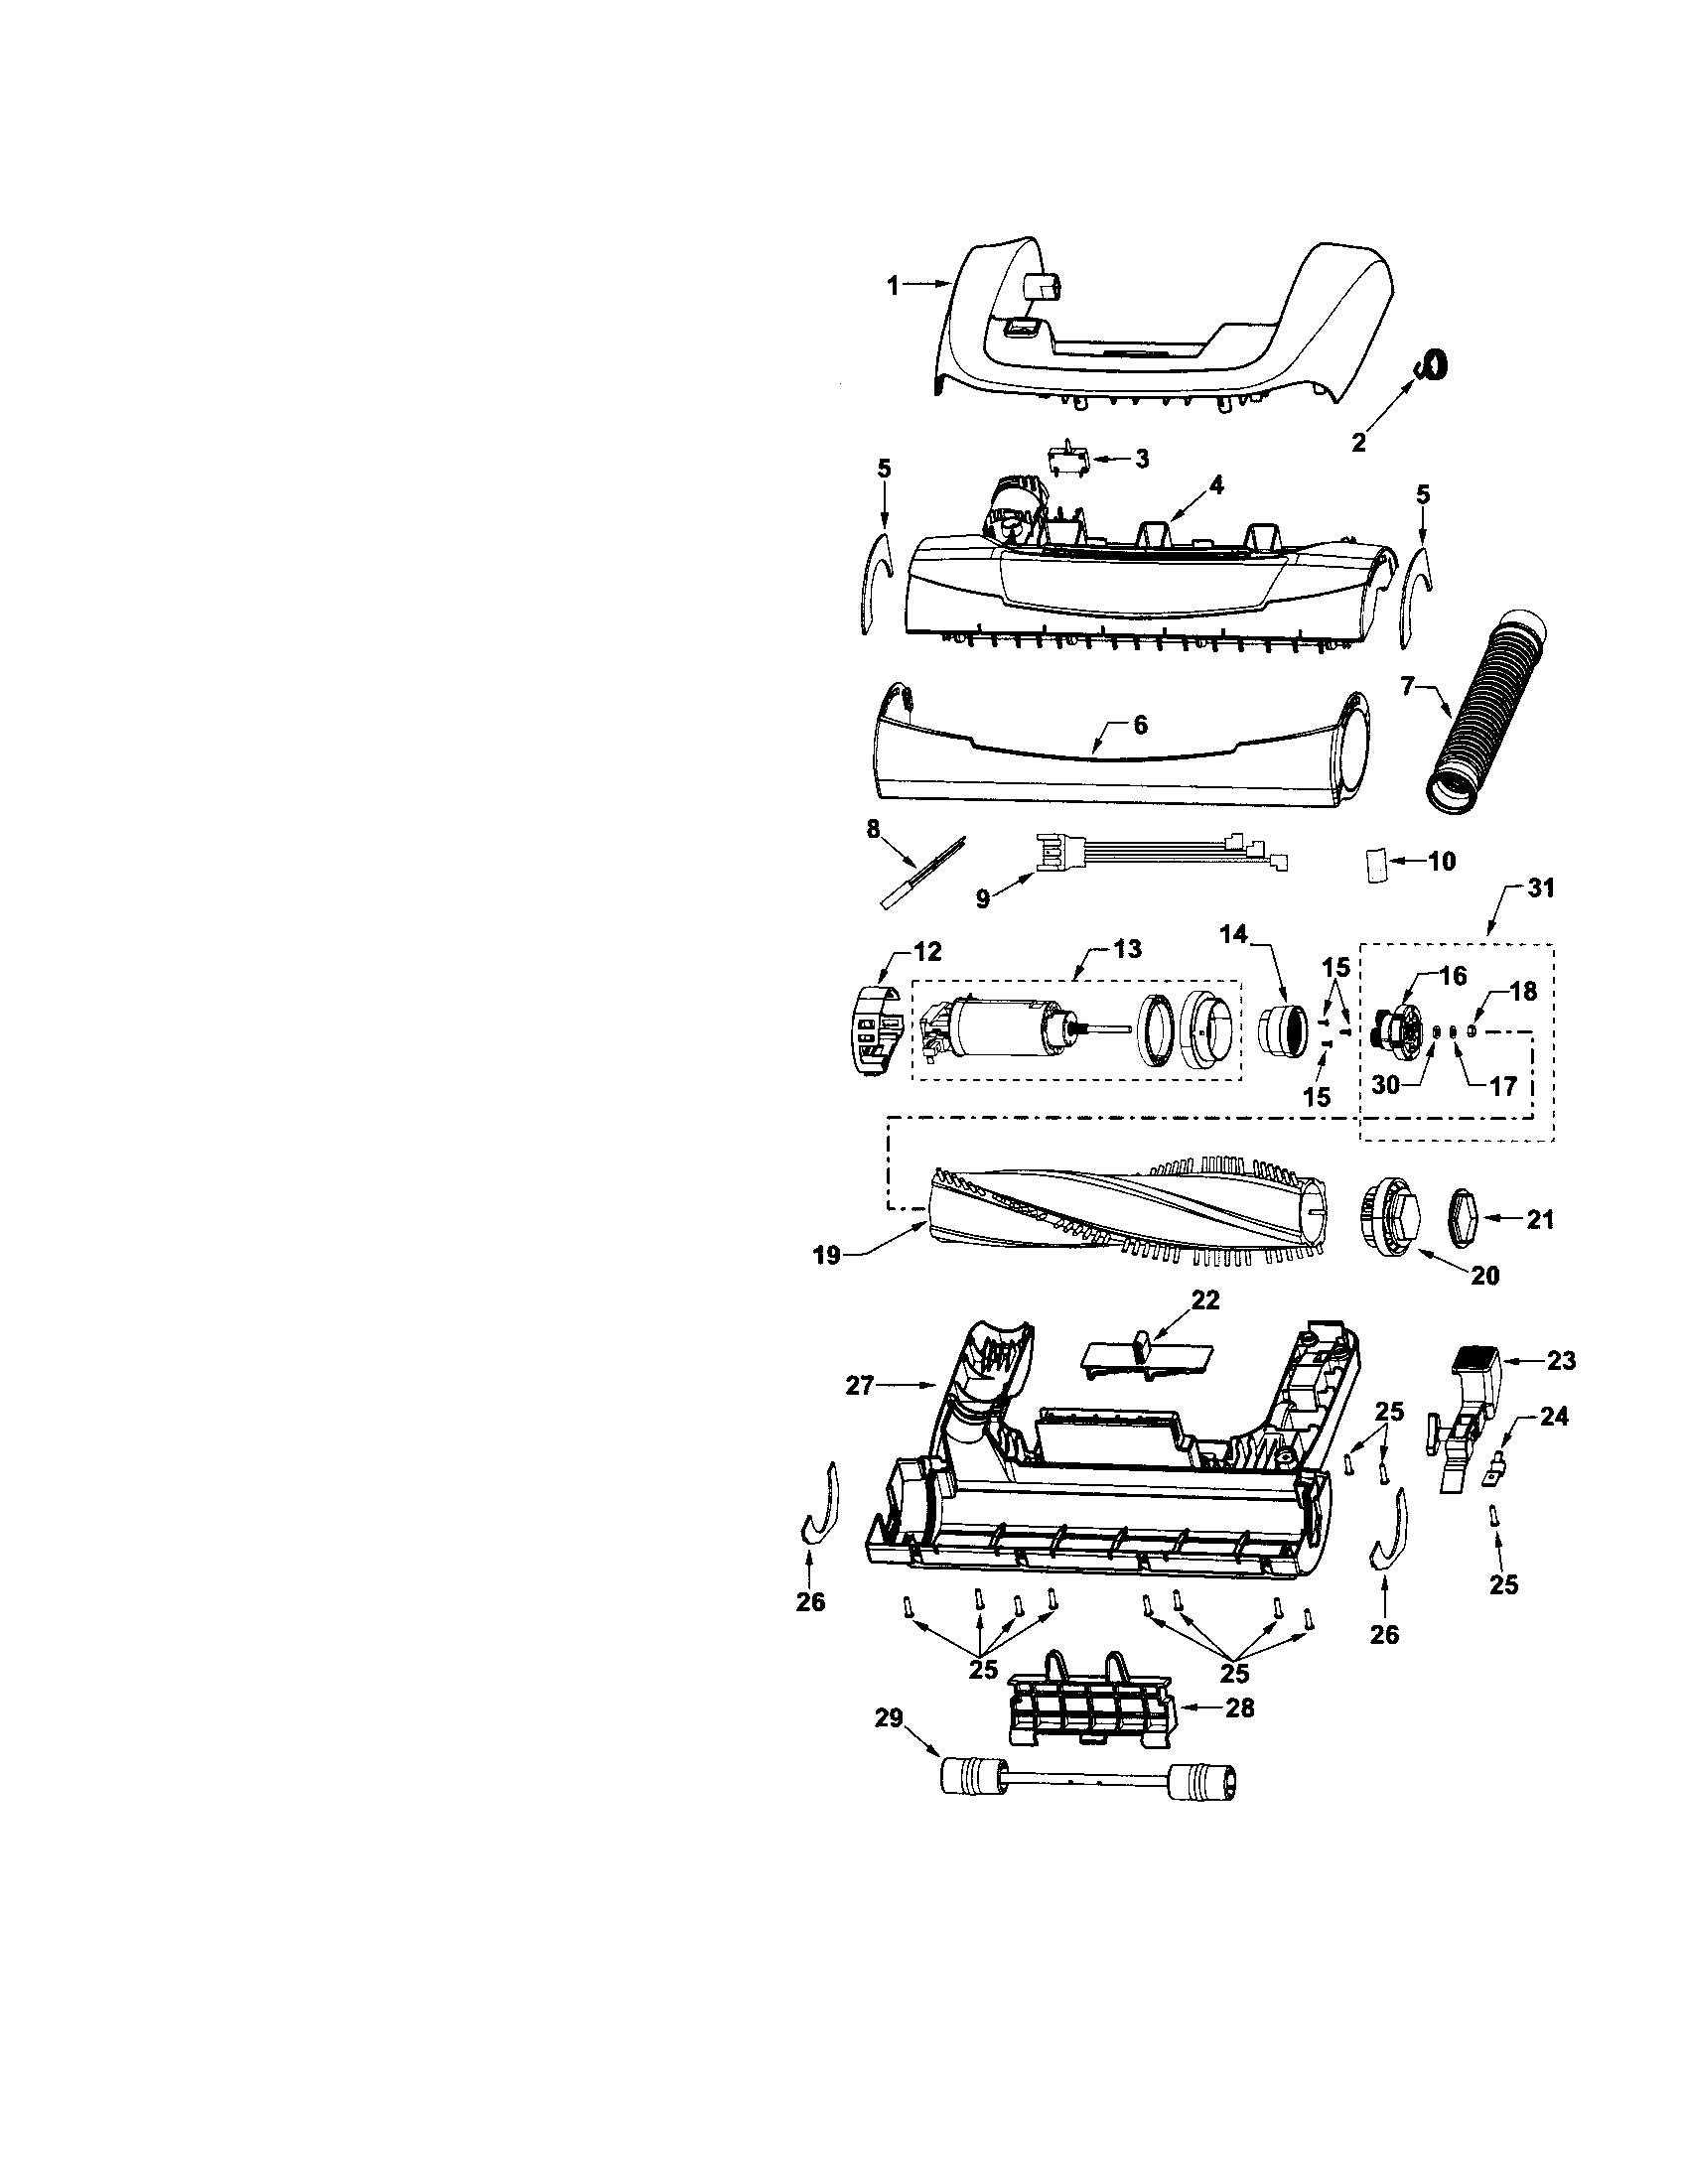 Vacuum Parts: Kenmore Parts Vacuum Model 116